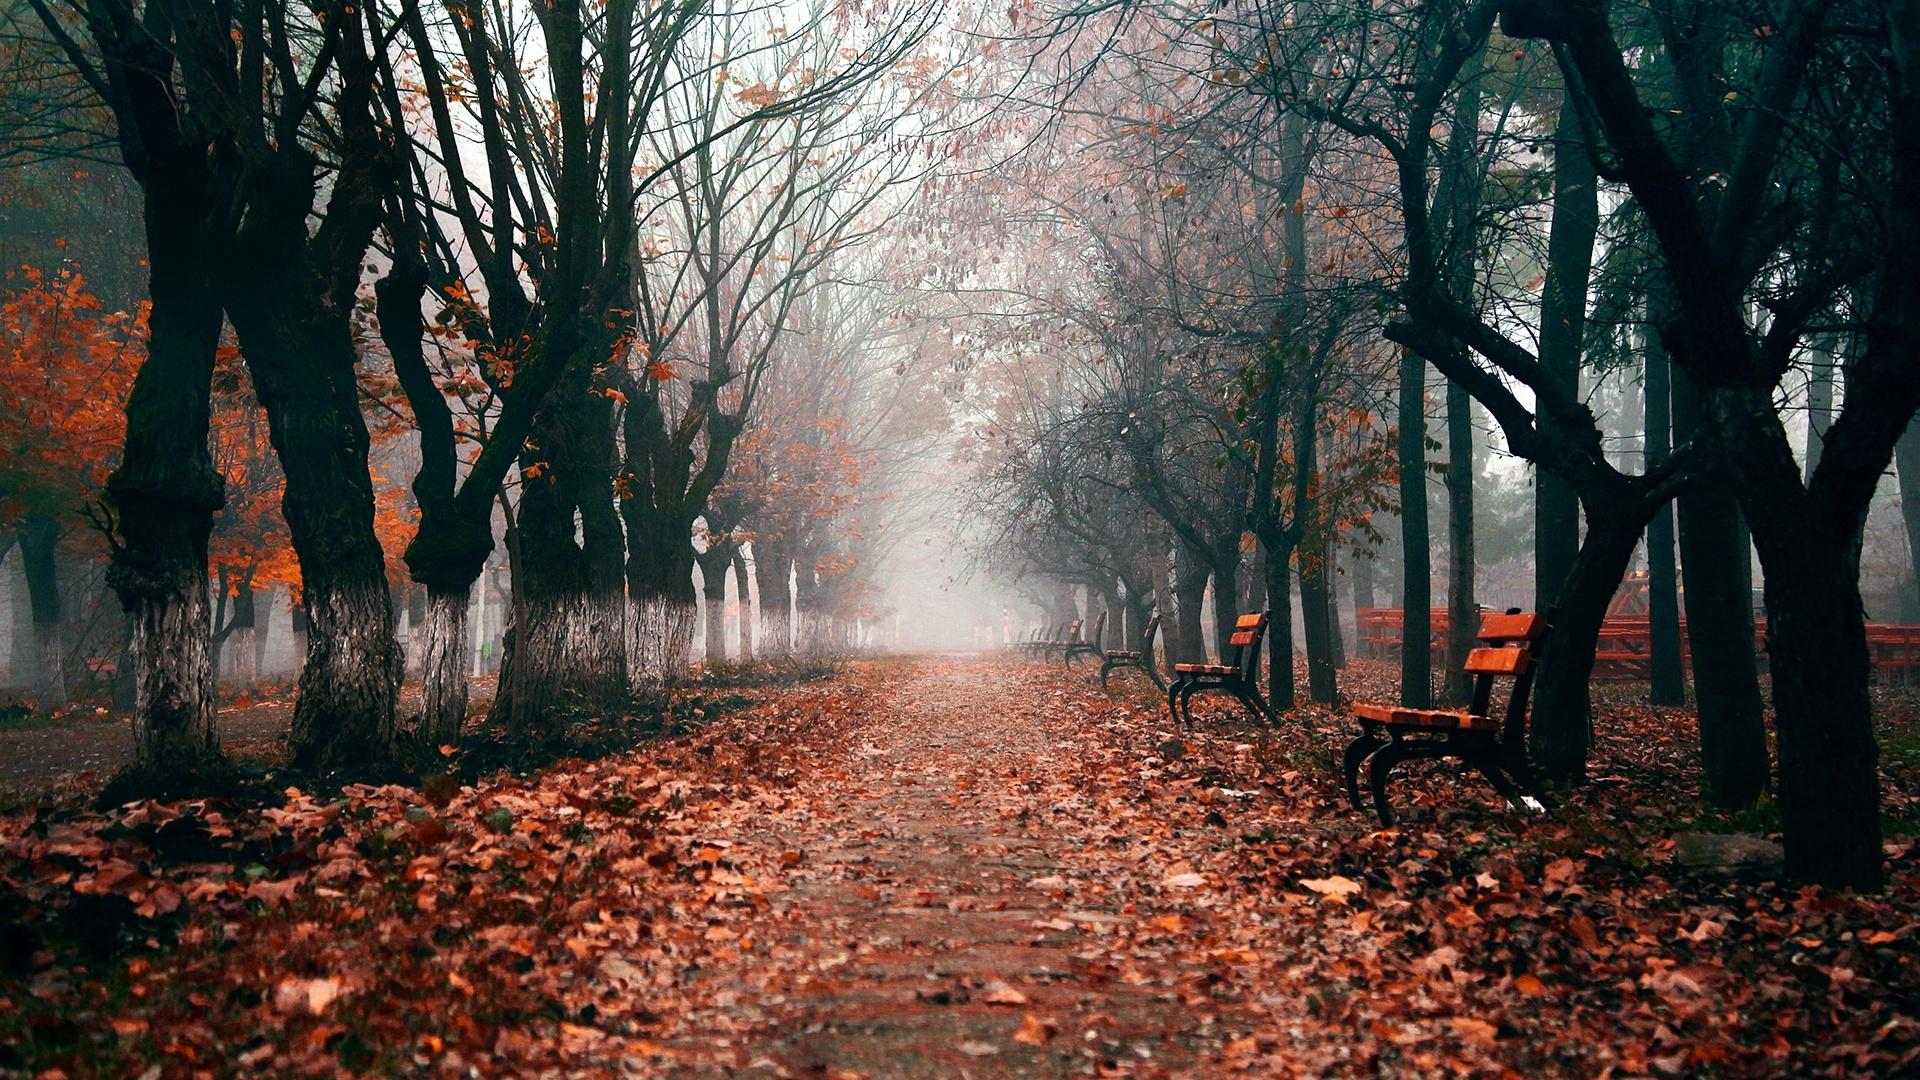 Dark Autumn hd wallpaper download